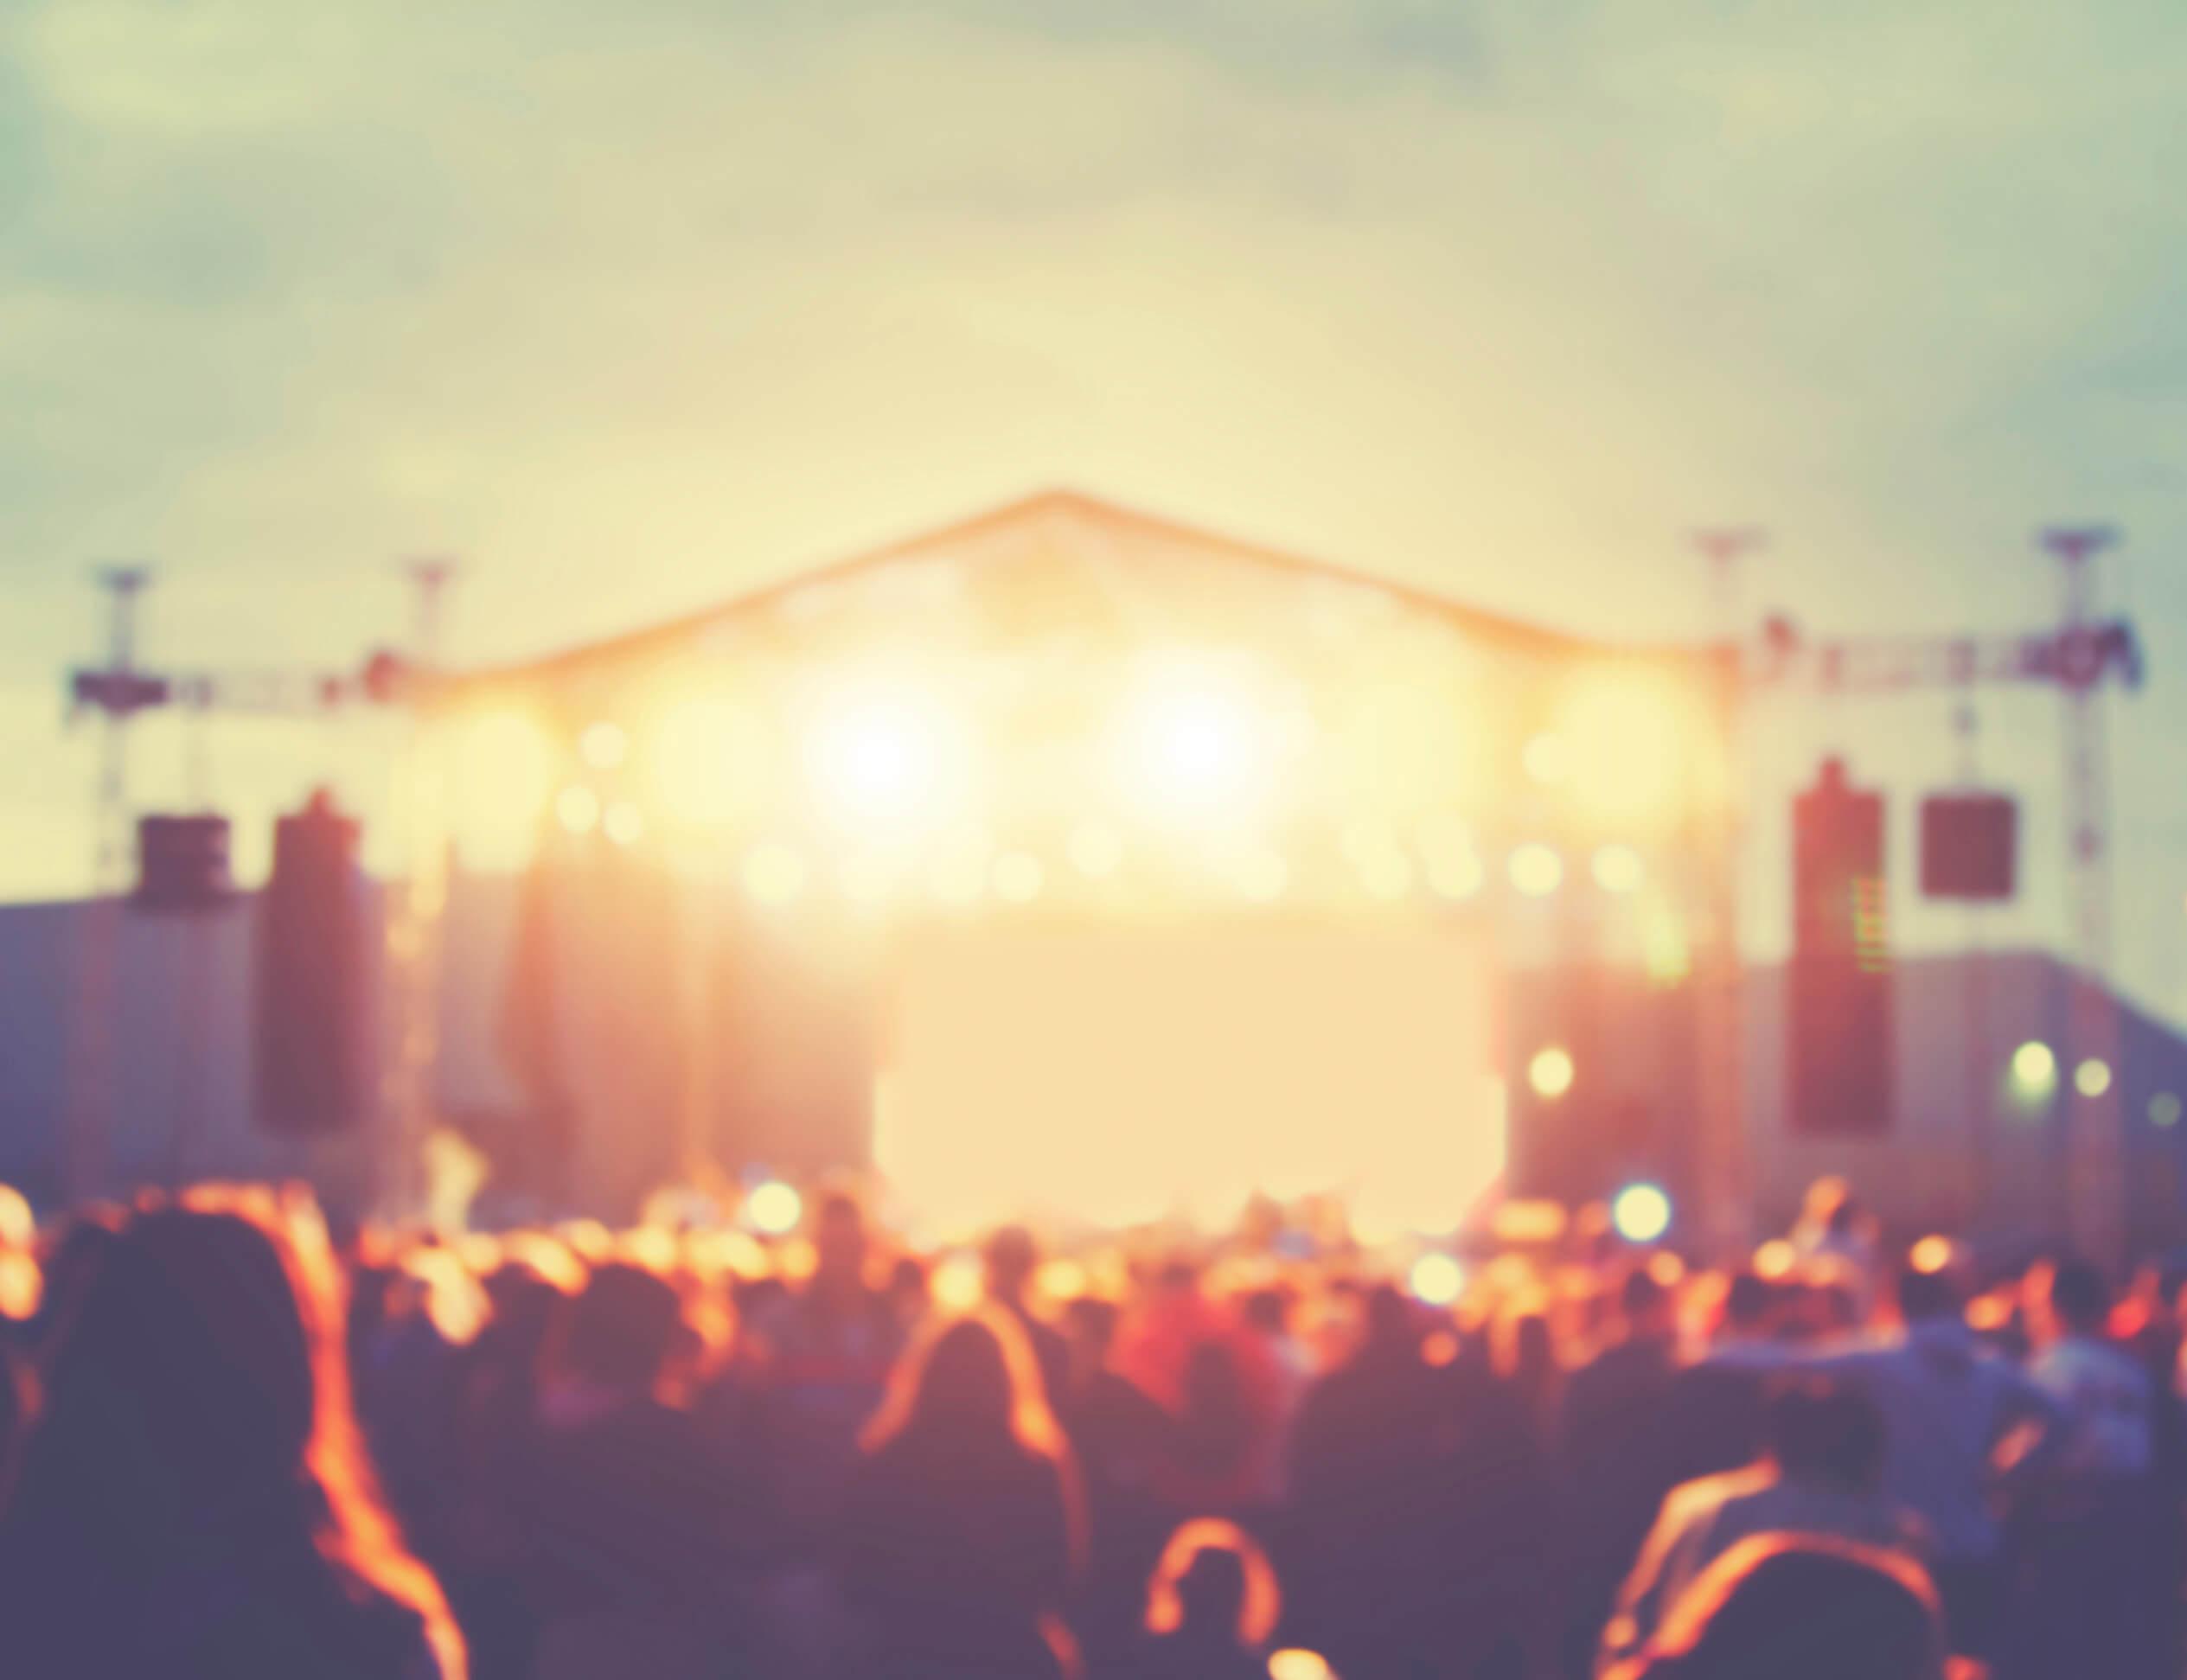 sziget festival concert